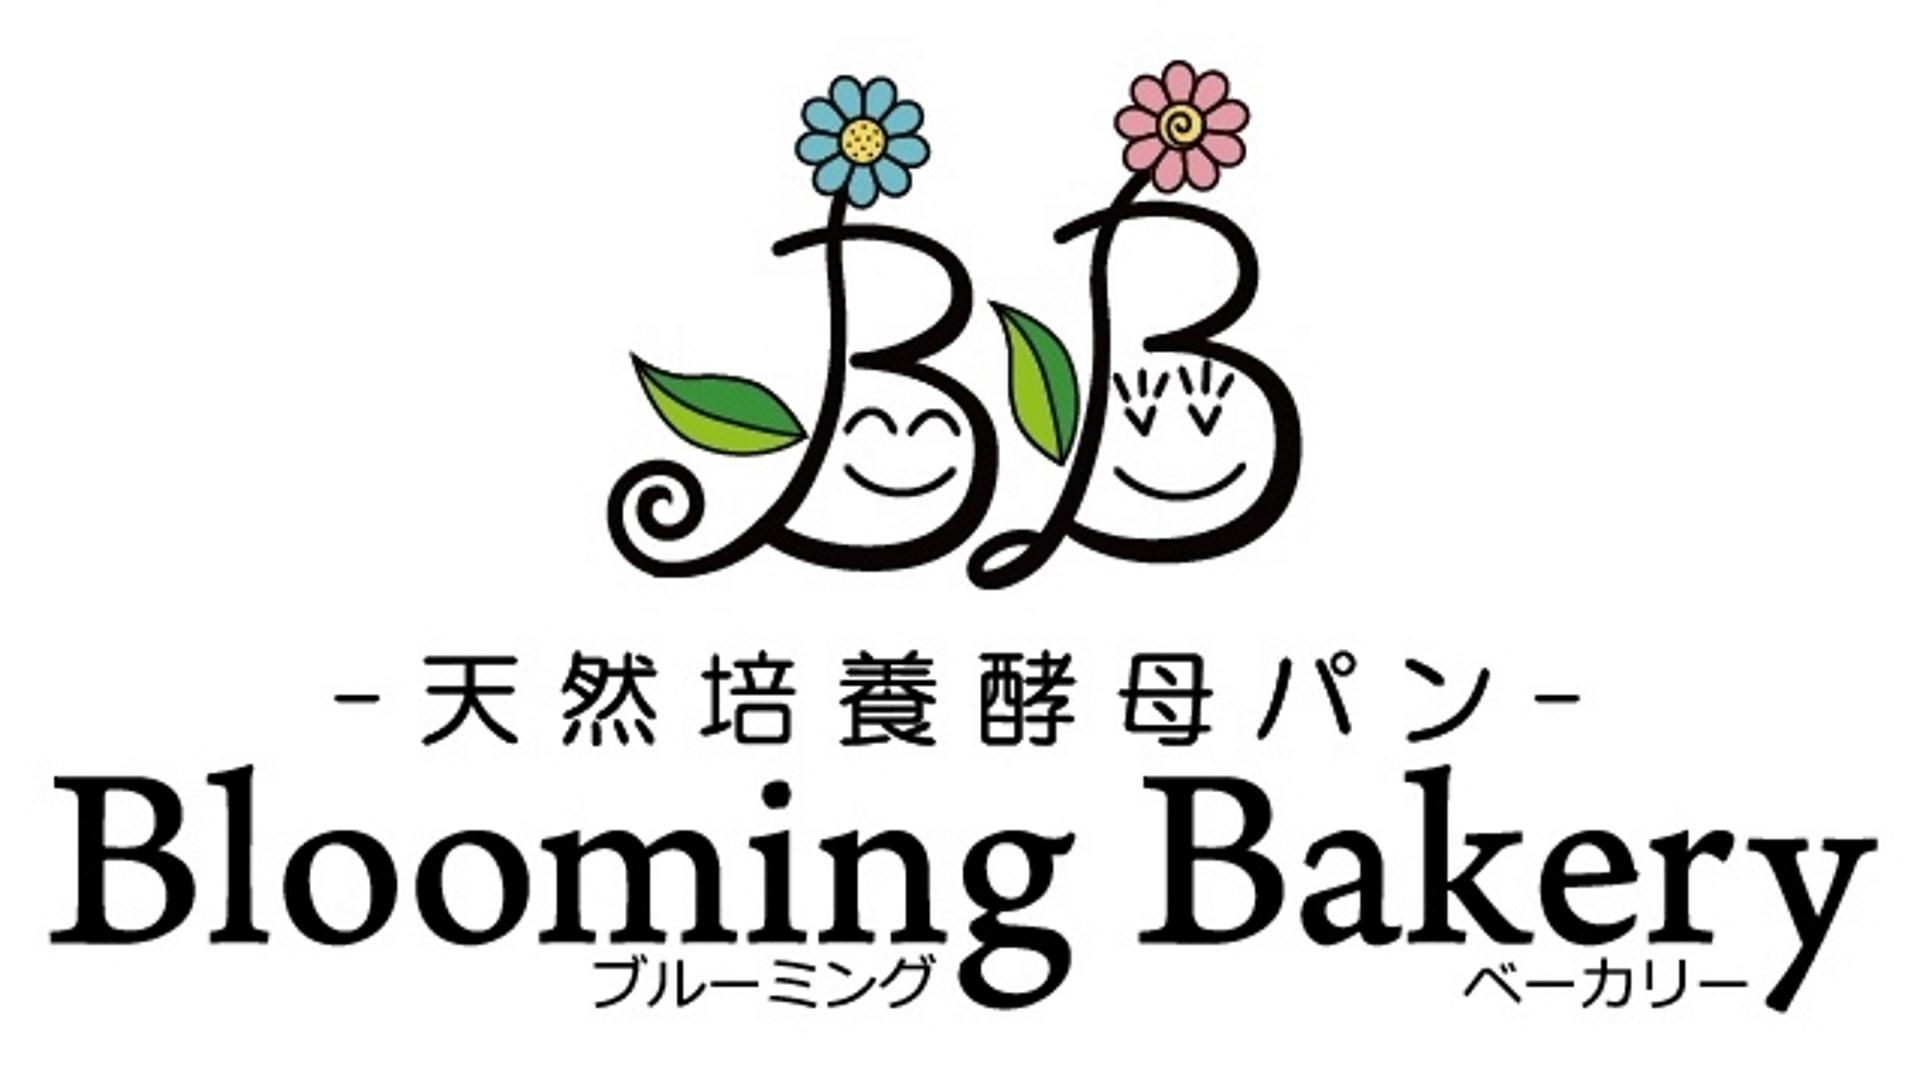 天然培養酵母パン Blooming Bakery